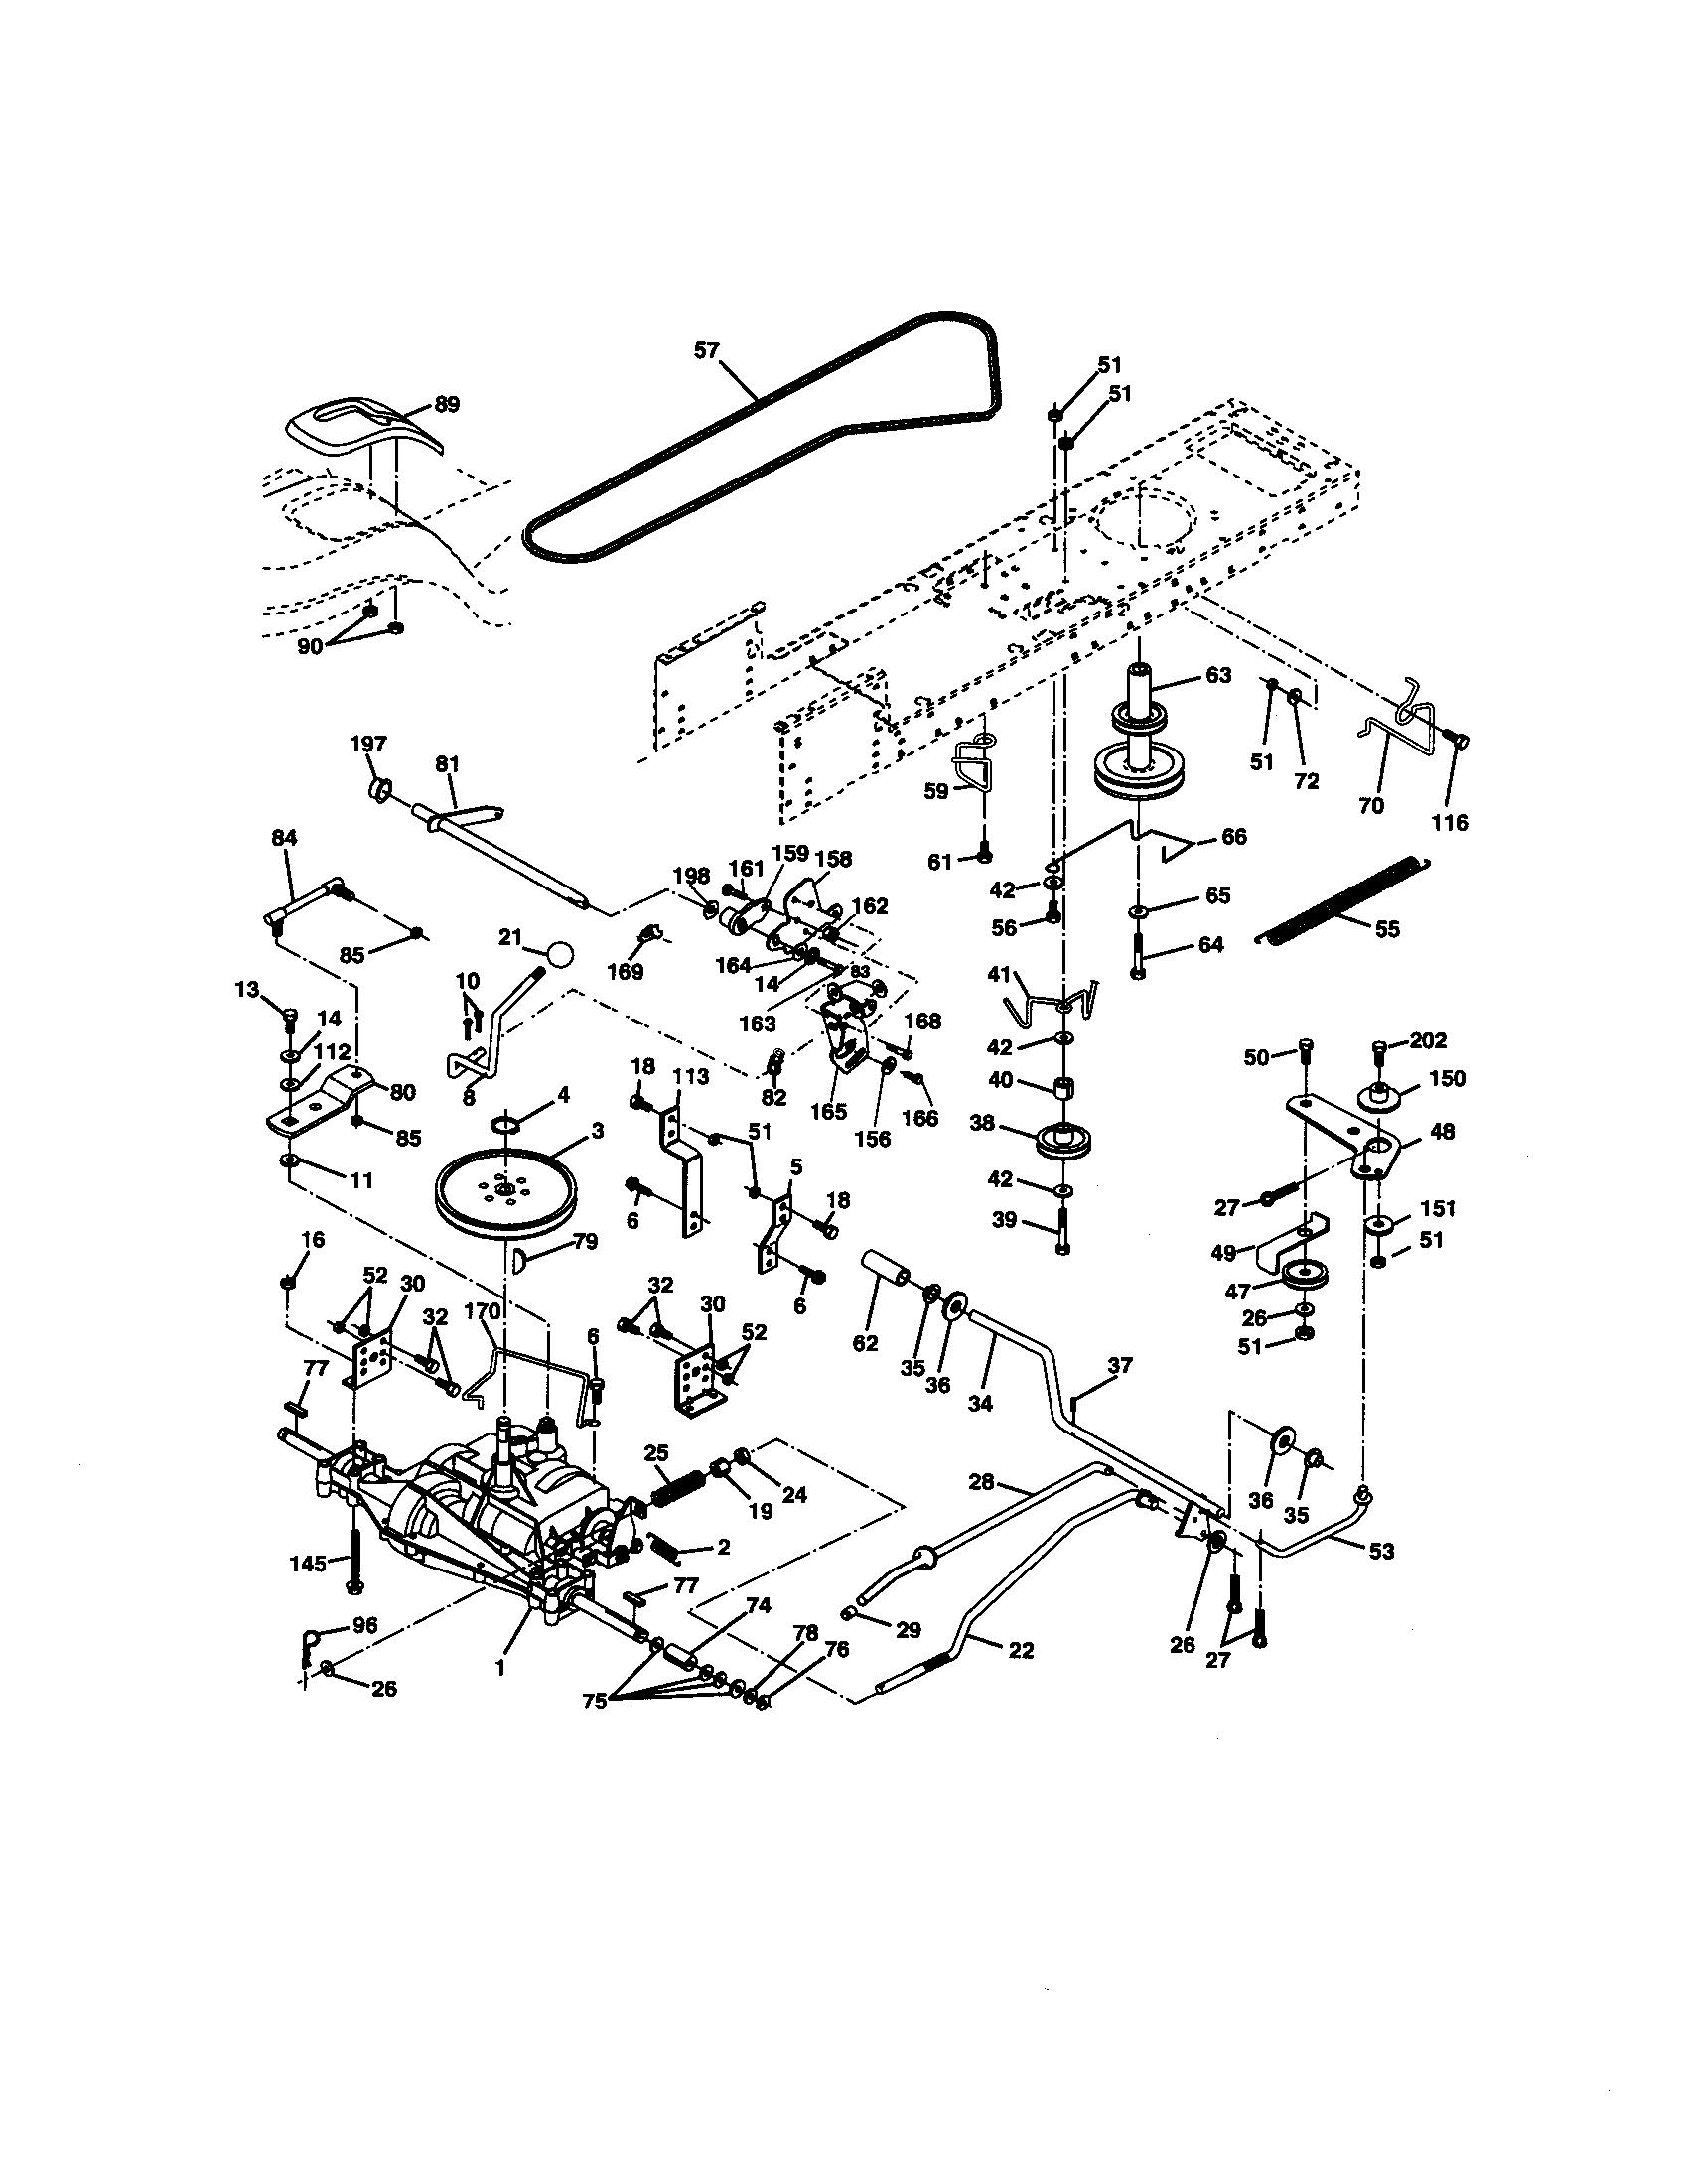 craftsman lawn tractor parts diagram energy level for boron model 917270671 genuine